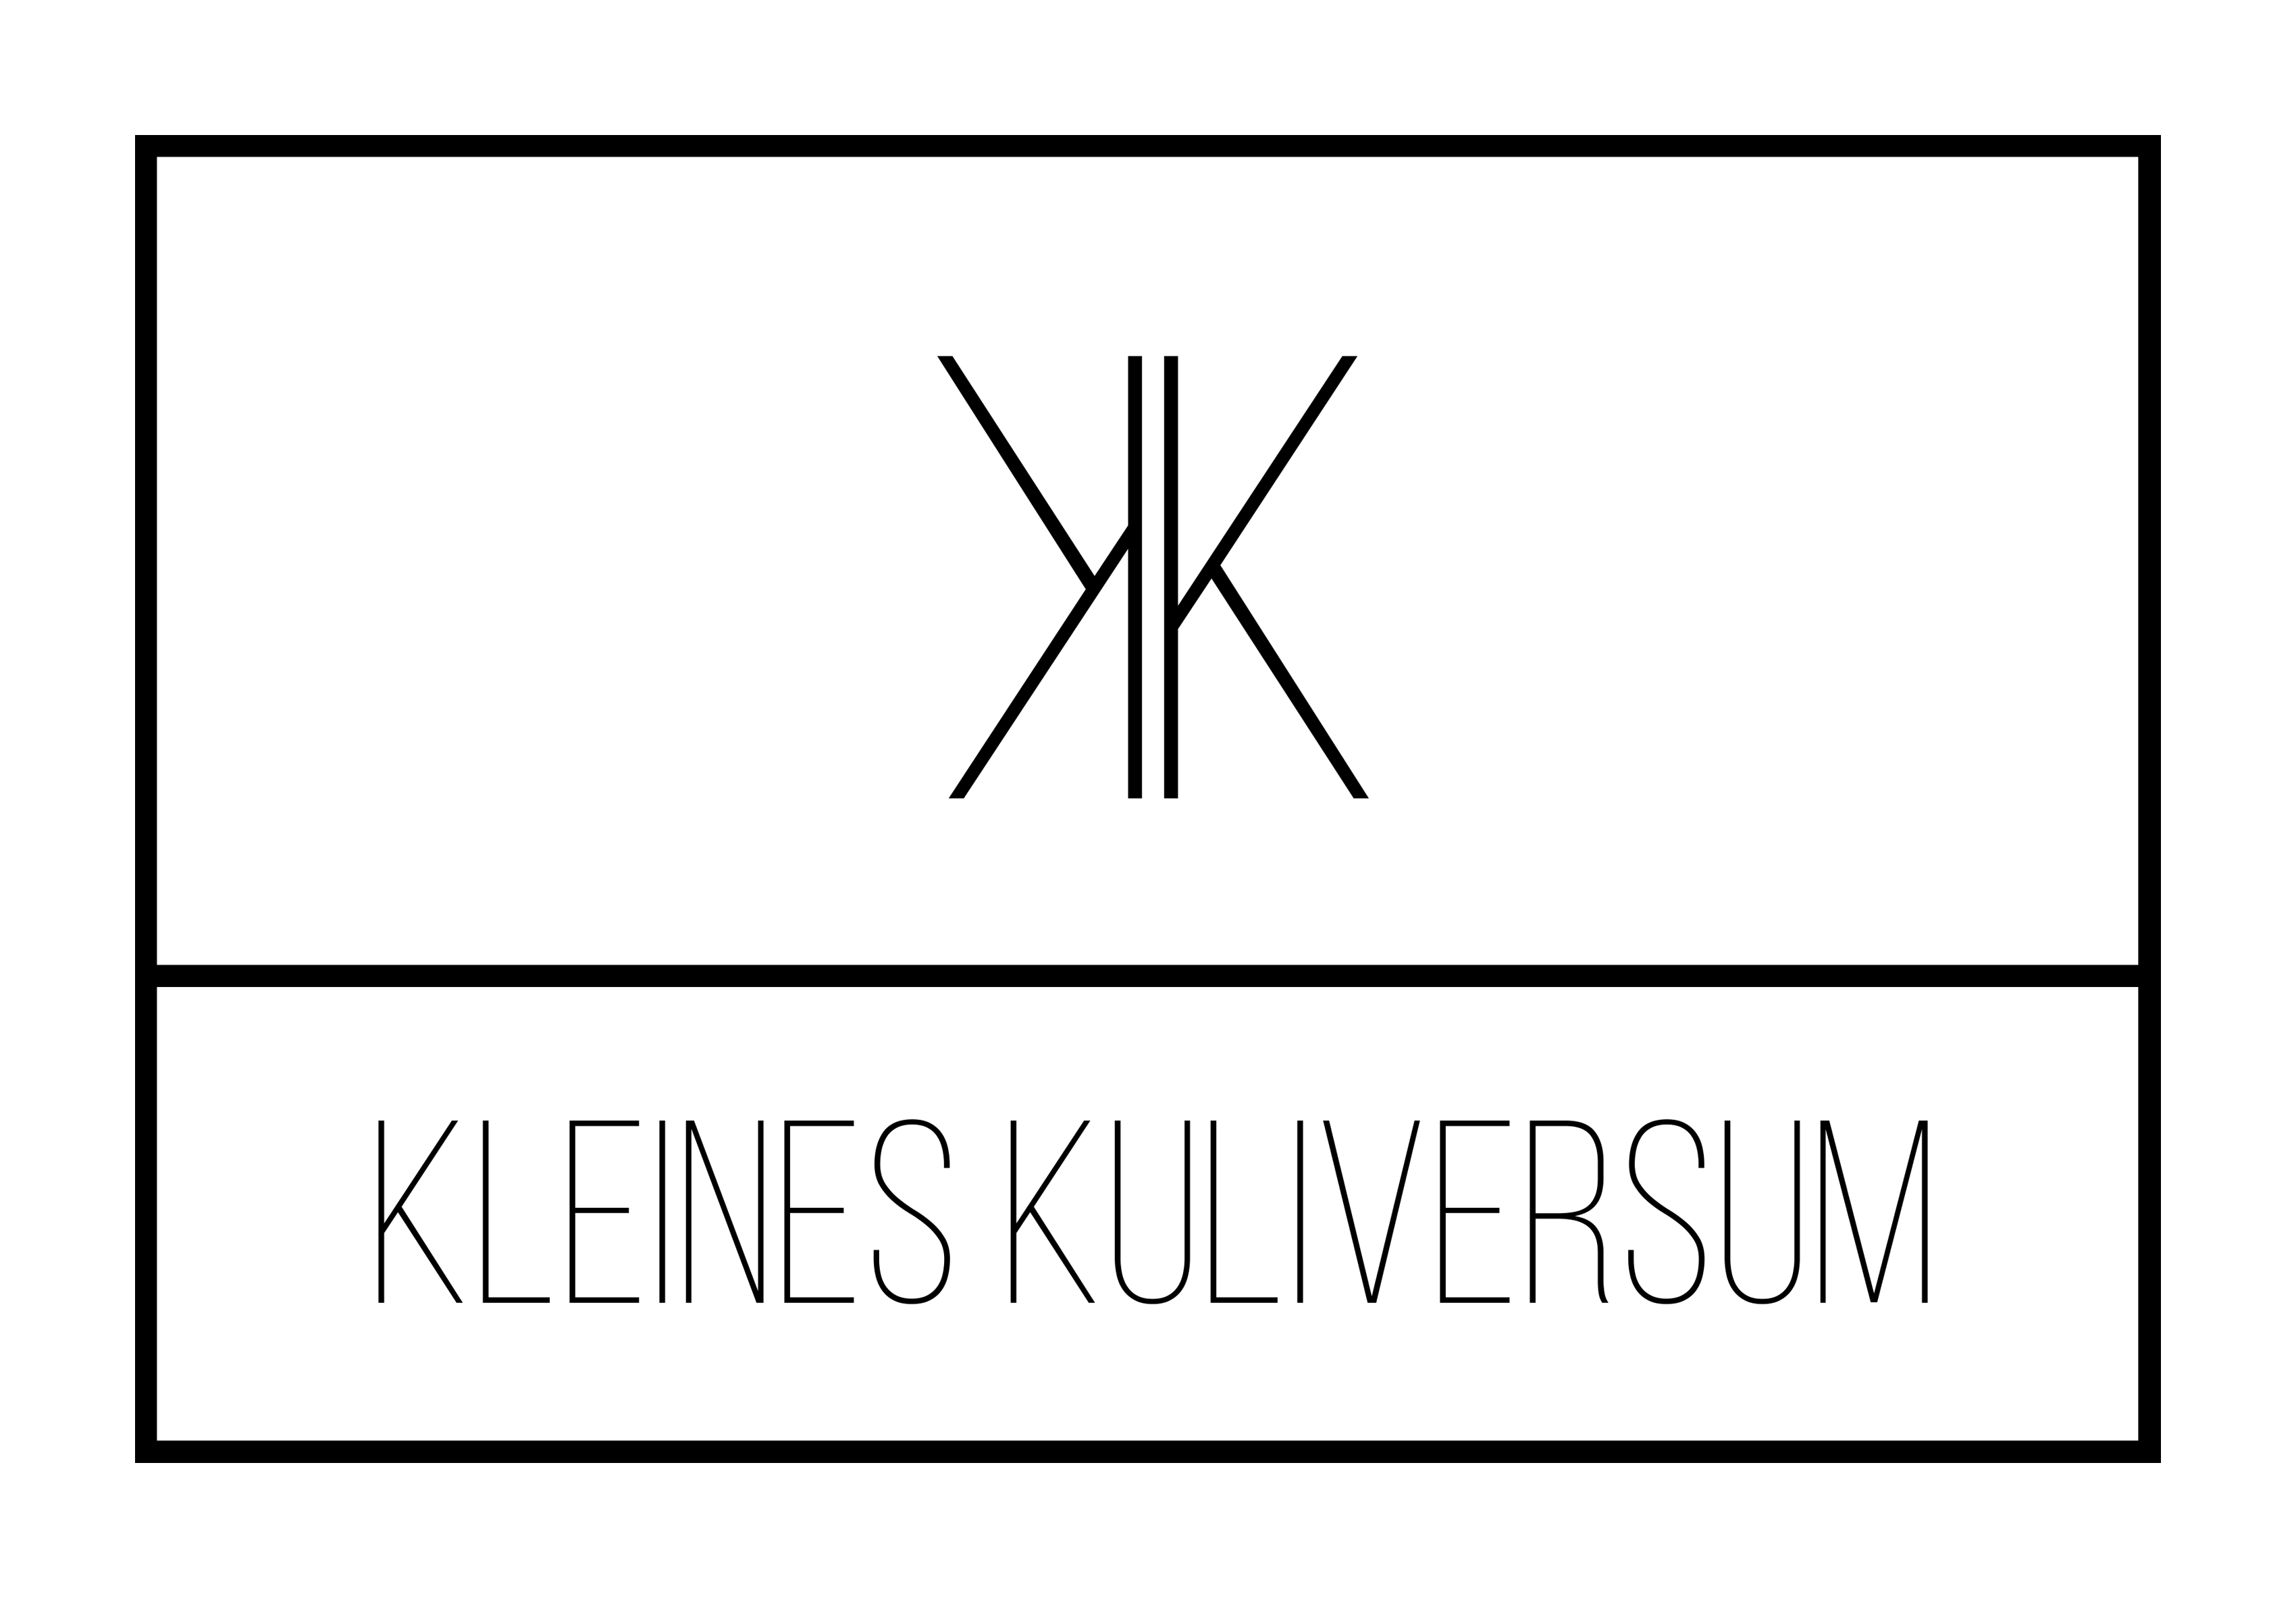 Avatar Jill - Kleines Kuliversum